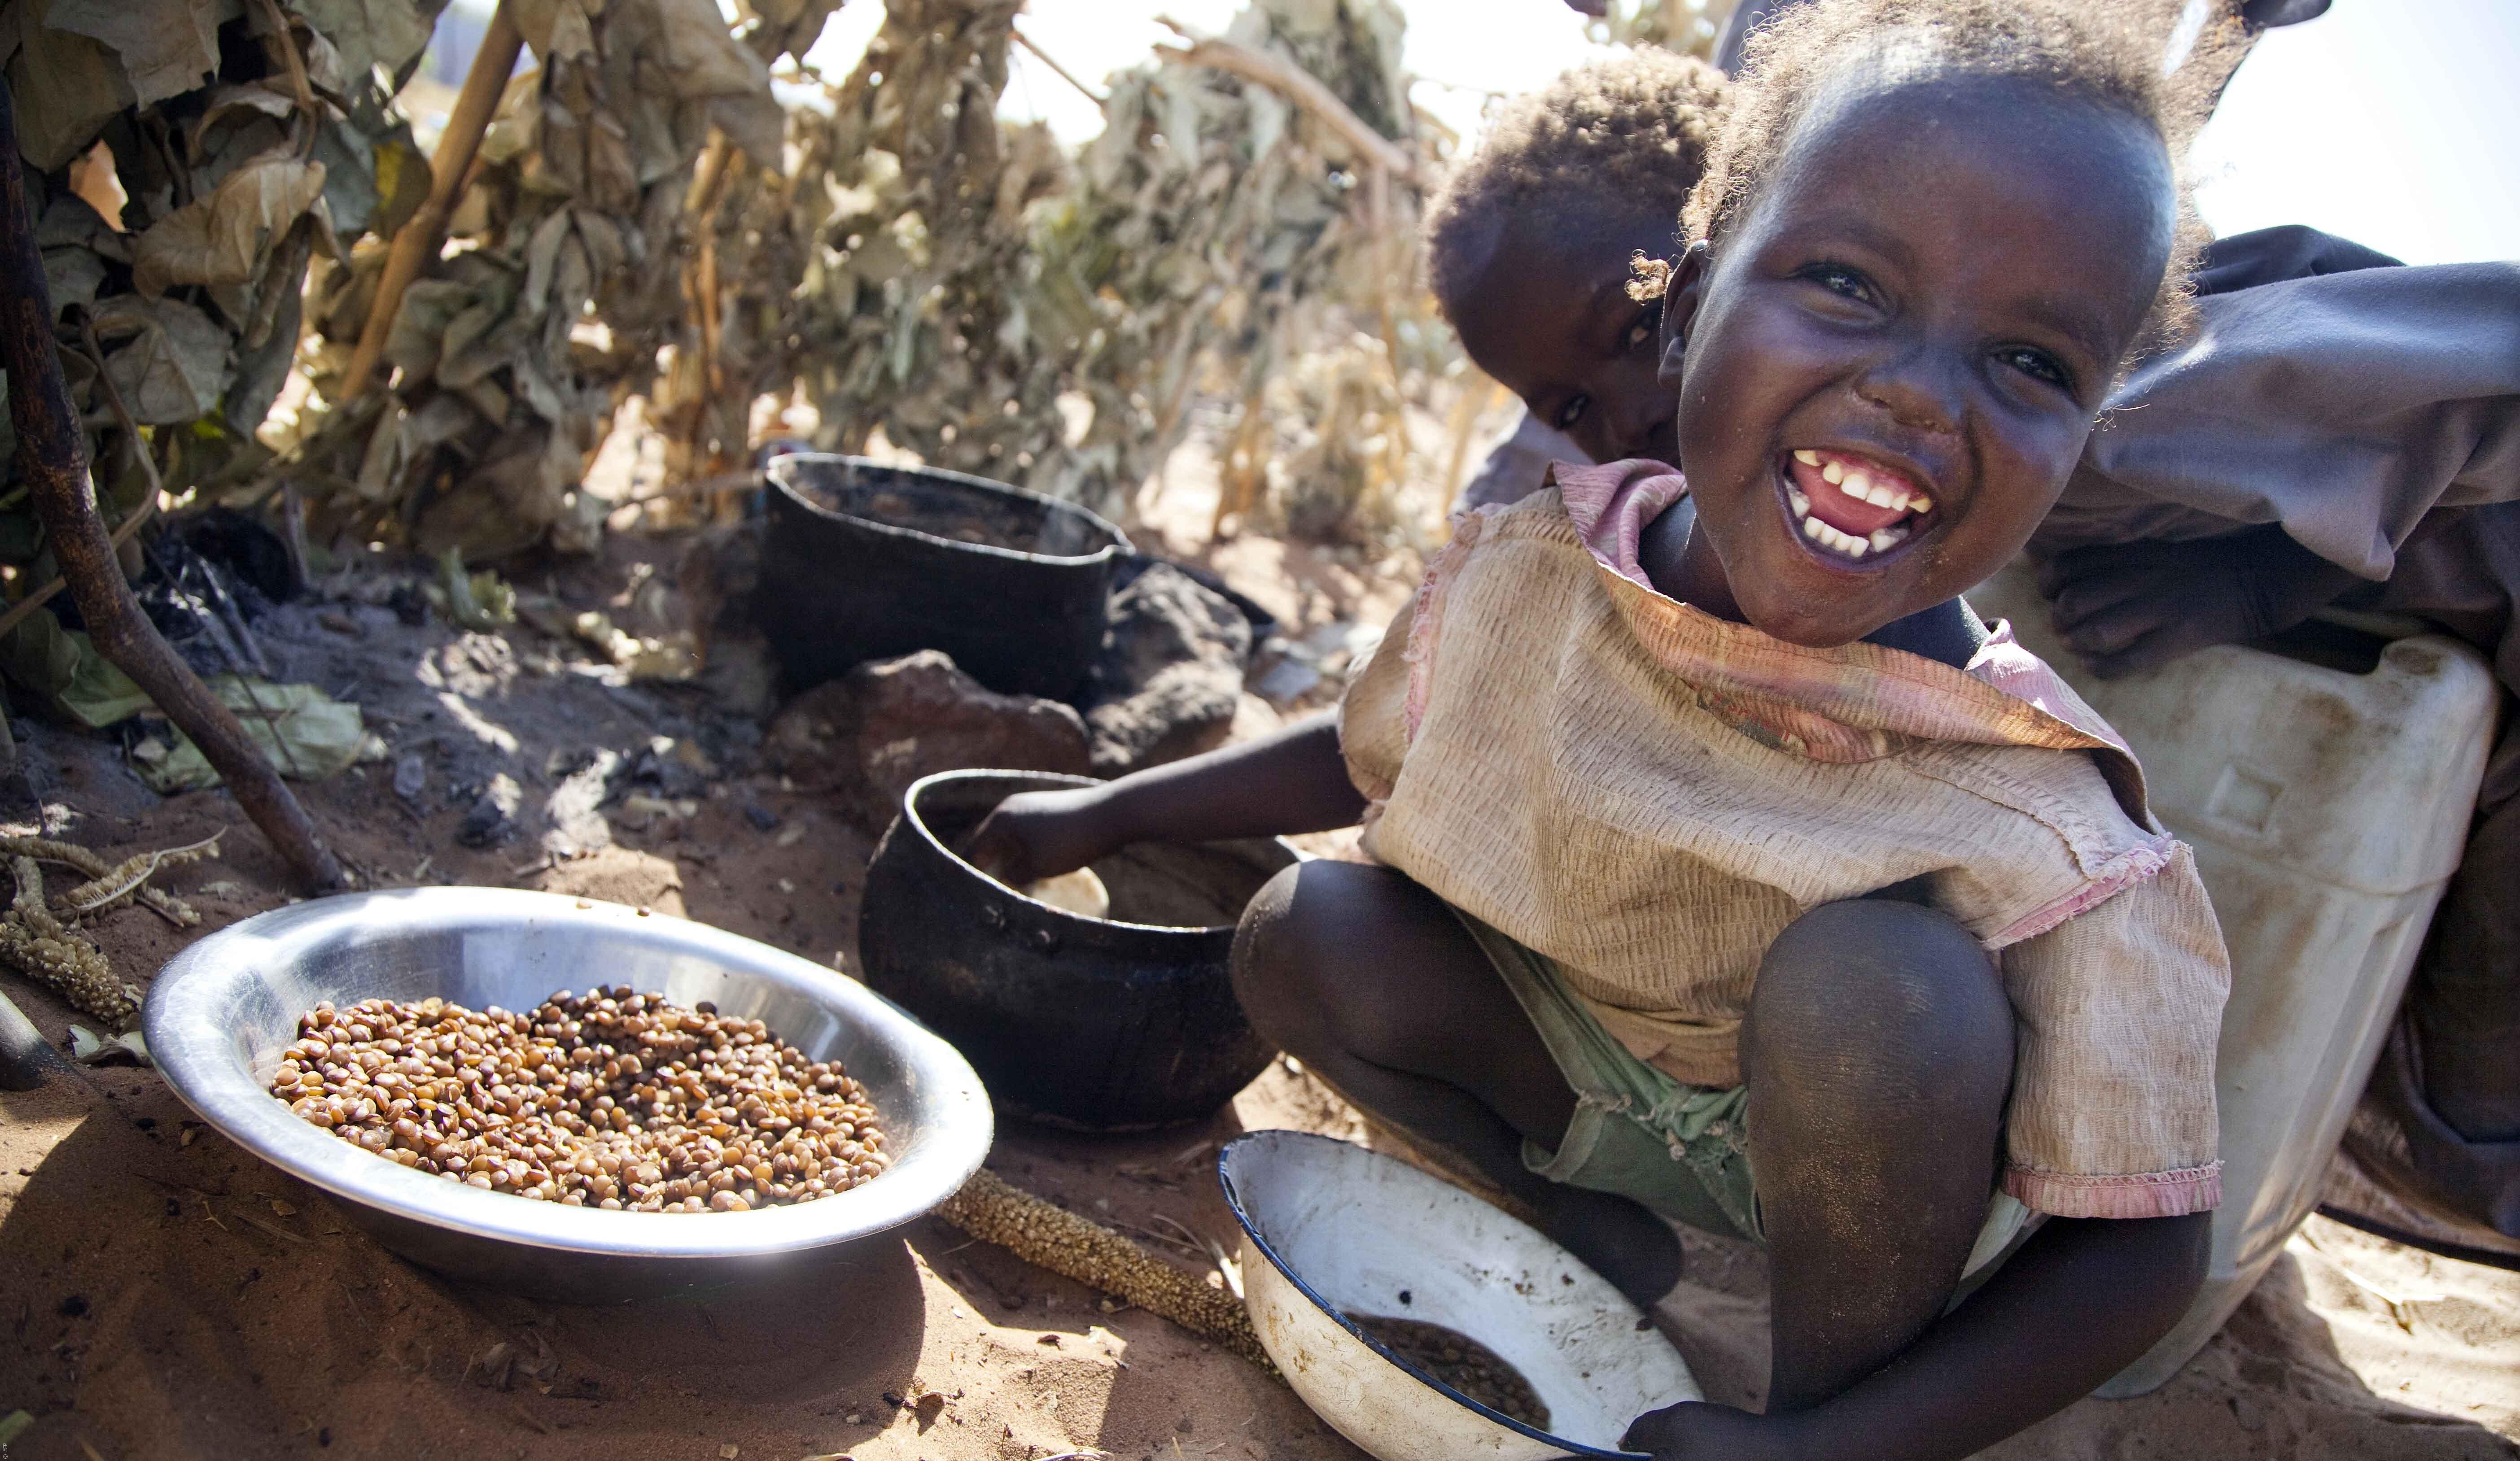 SUDAN-DARFUR-UN-REFUGEES